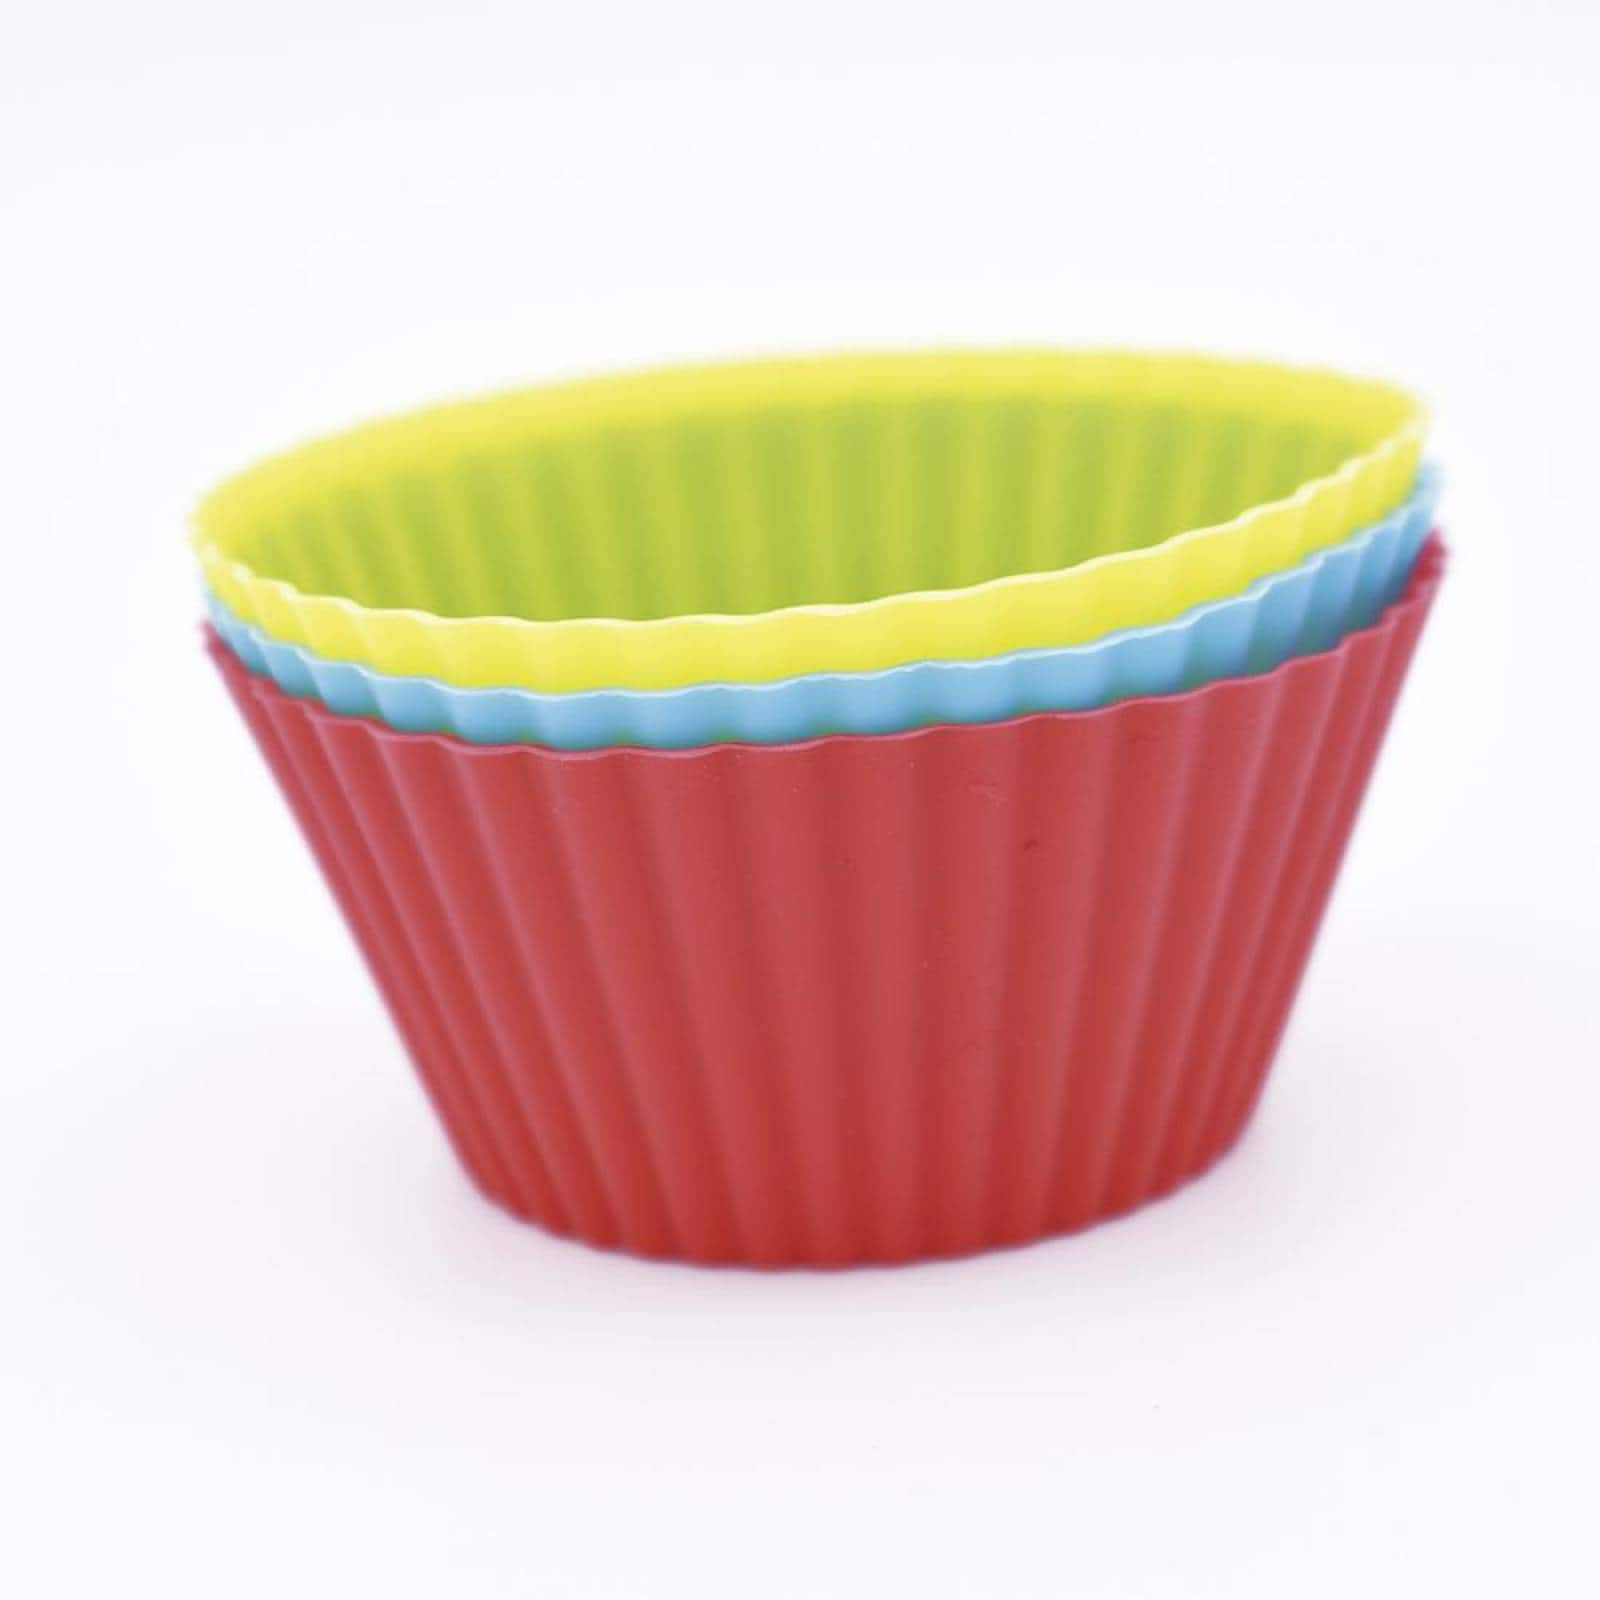 12 moldes para Cupcakes Muffins o Pasteles